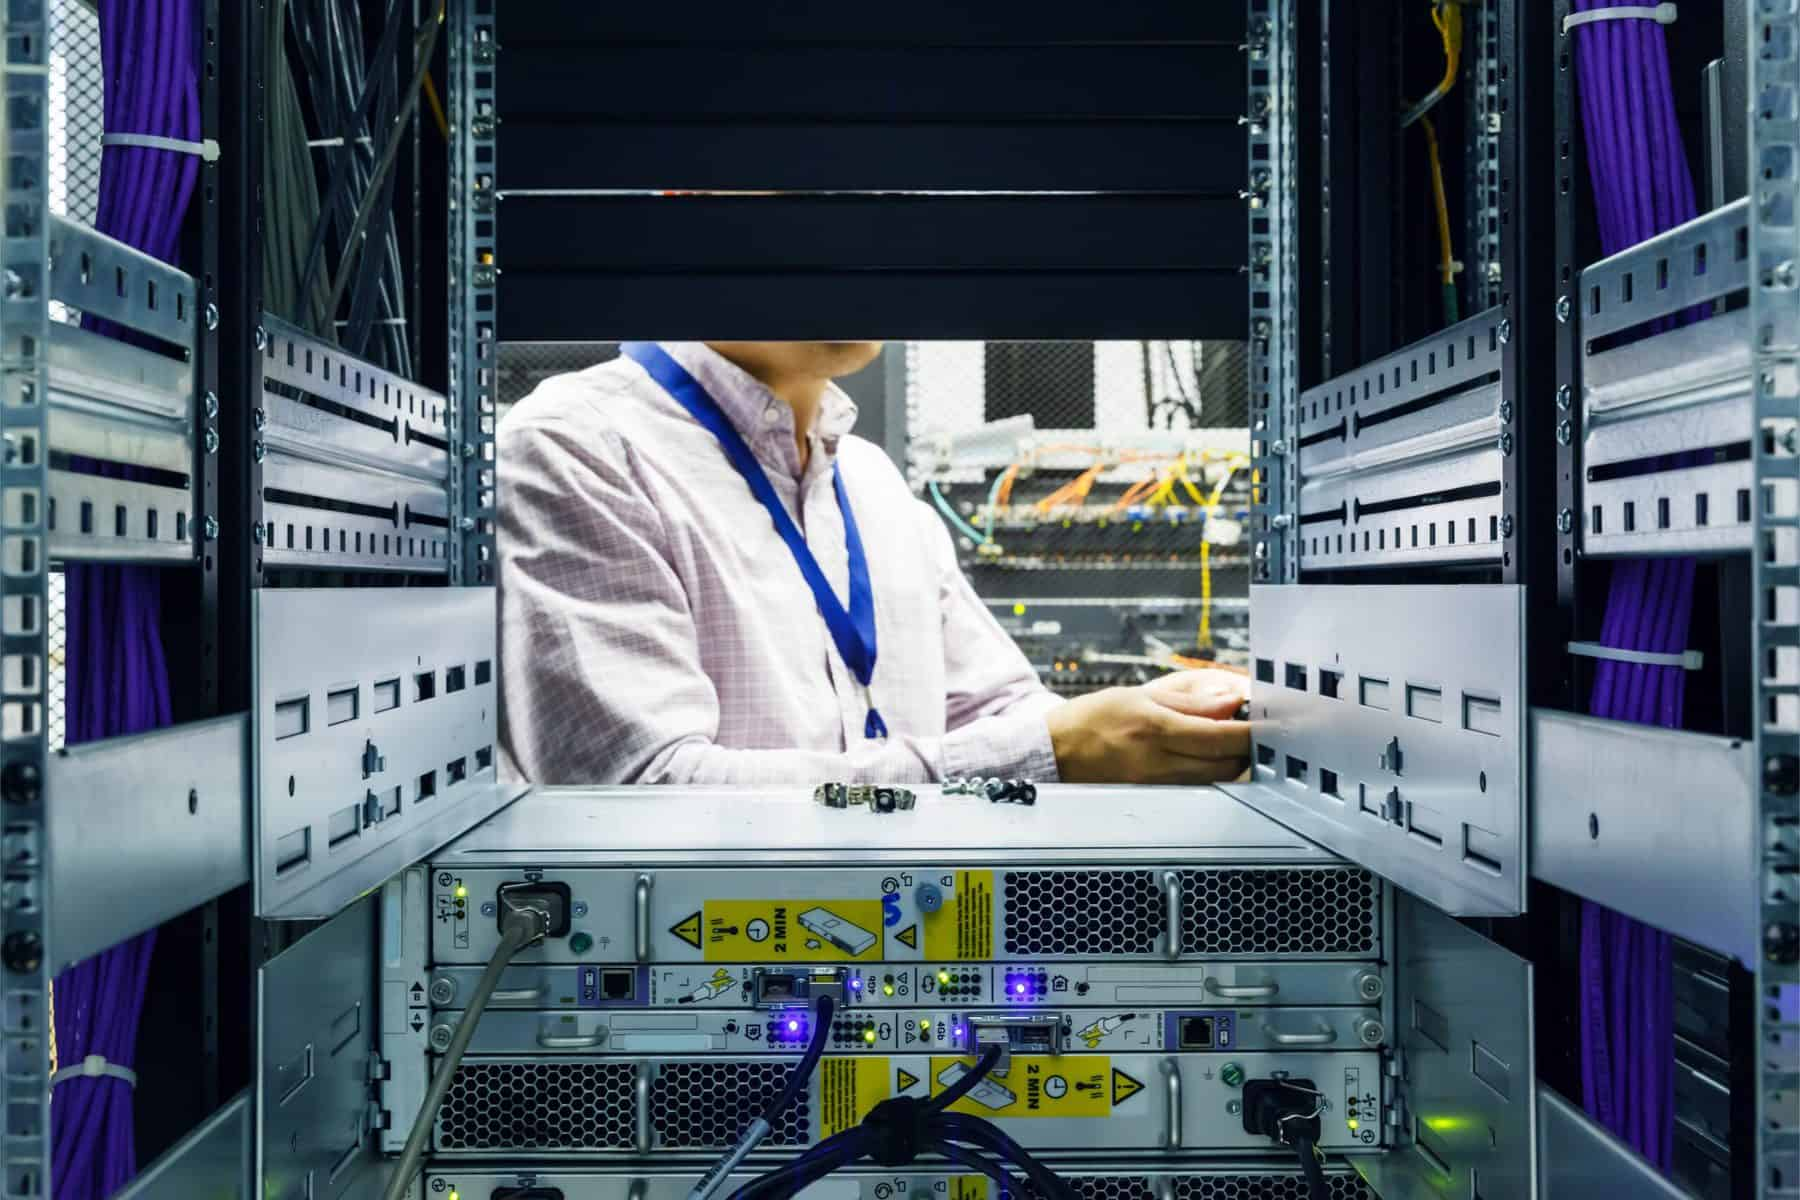 software-installation services